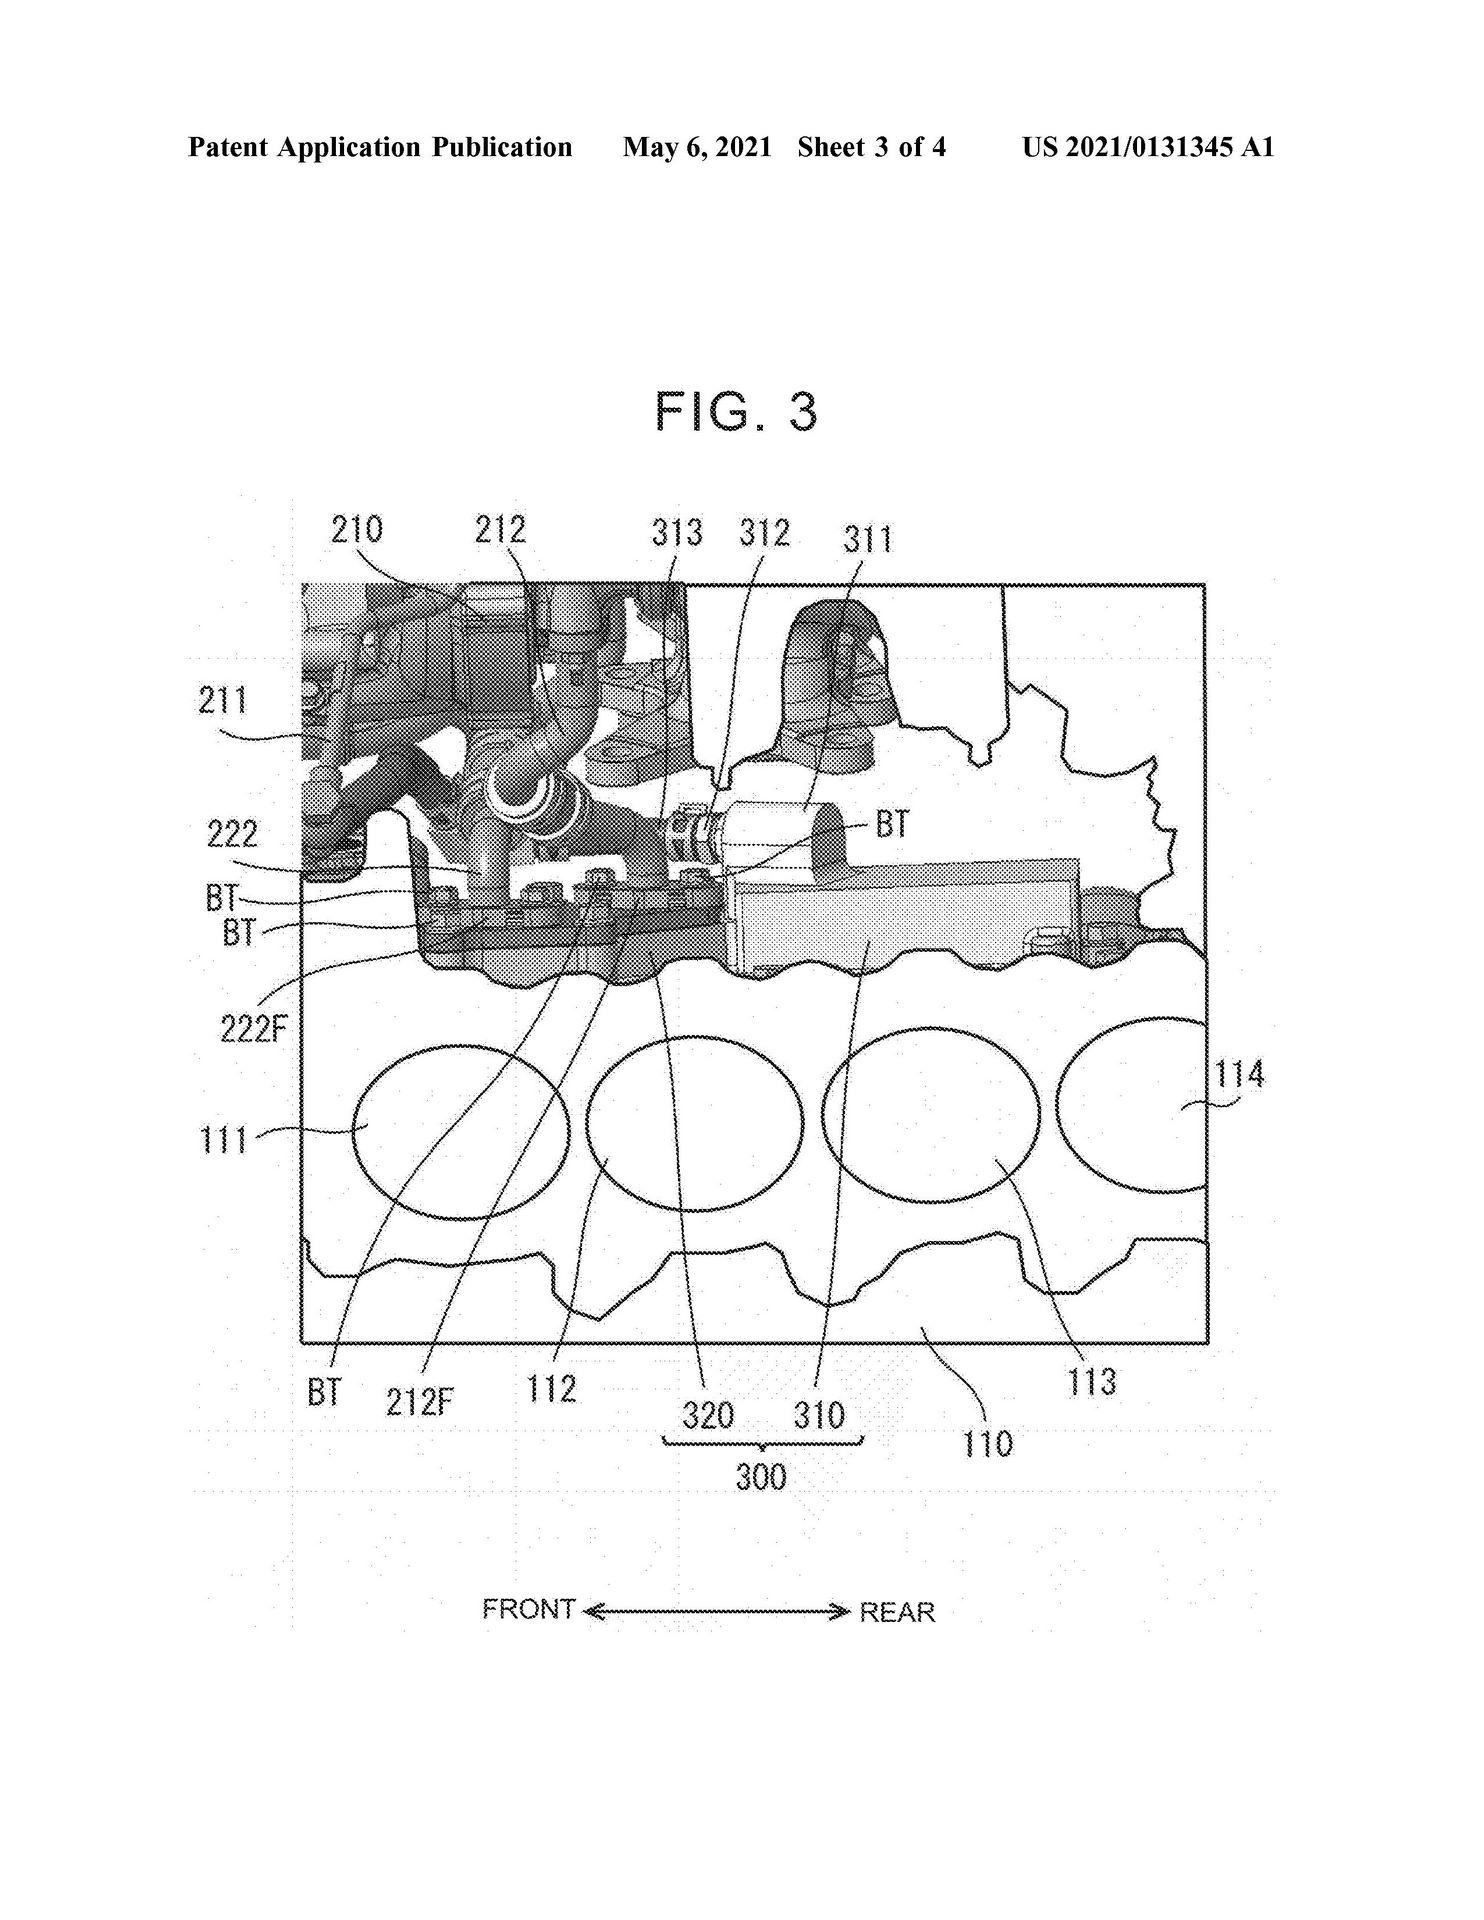 Toyota-Twin-Turbo-V8-Patent-0004